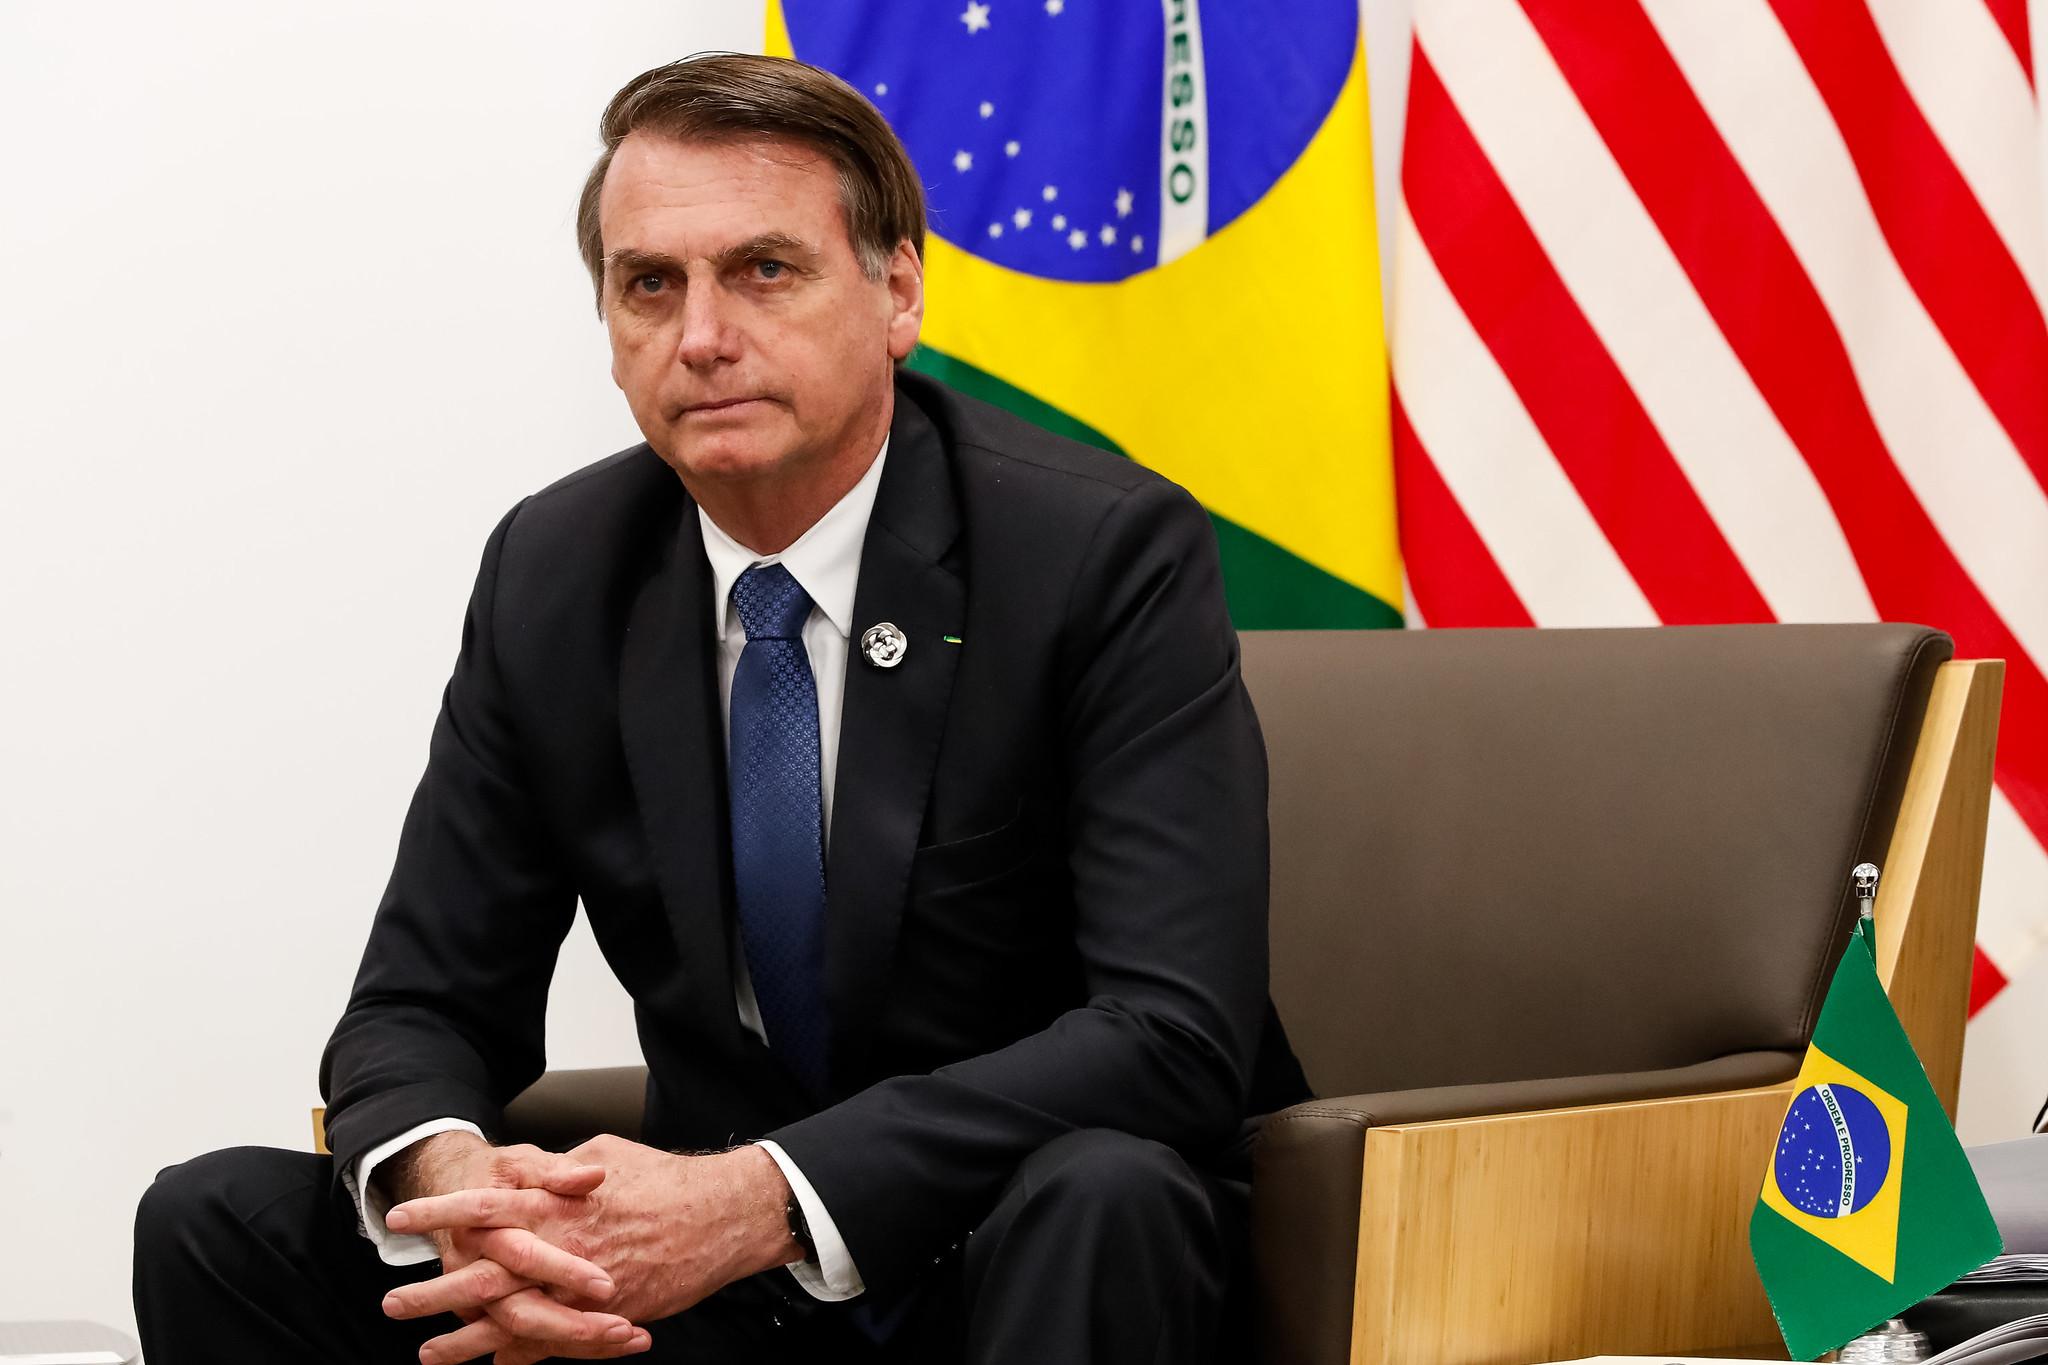 CNBB promete enquadrar Bolsonaro por convocar ato contra Congresso